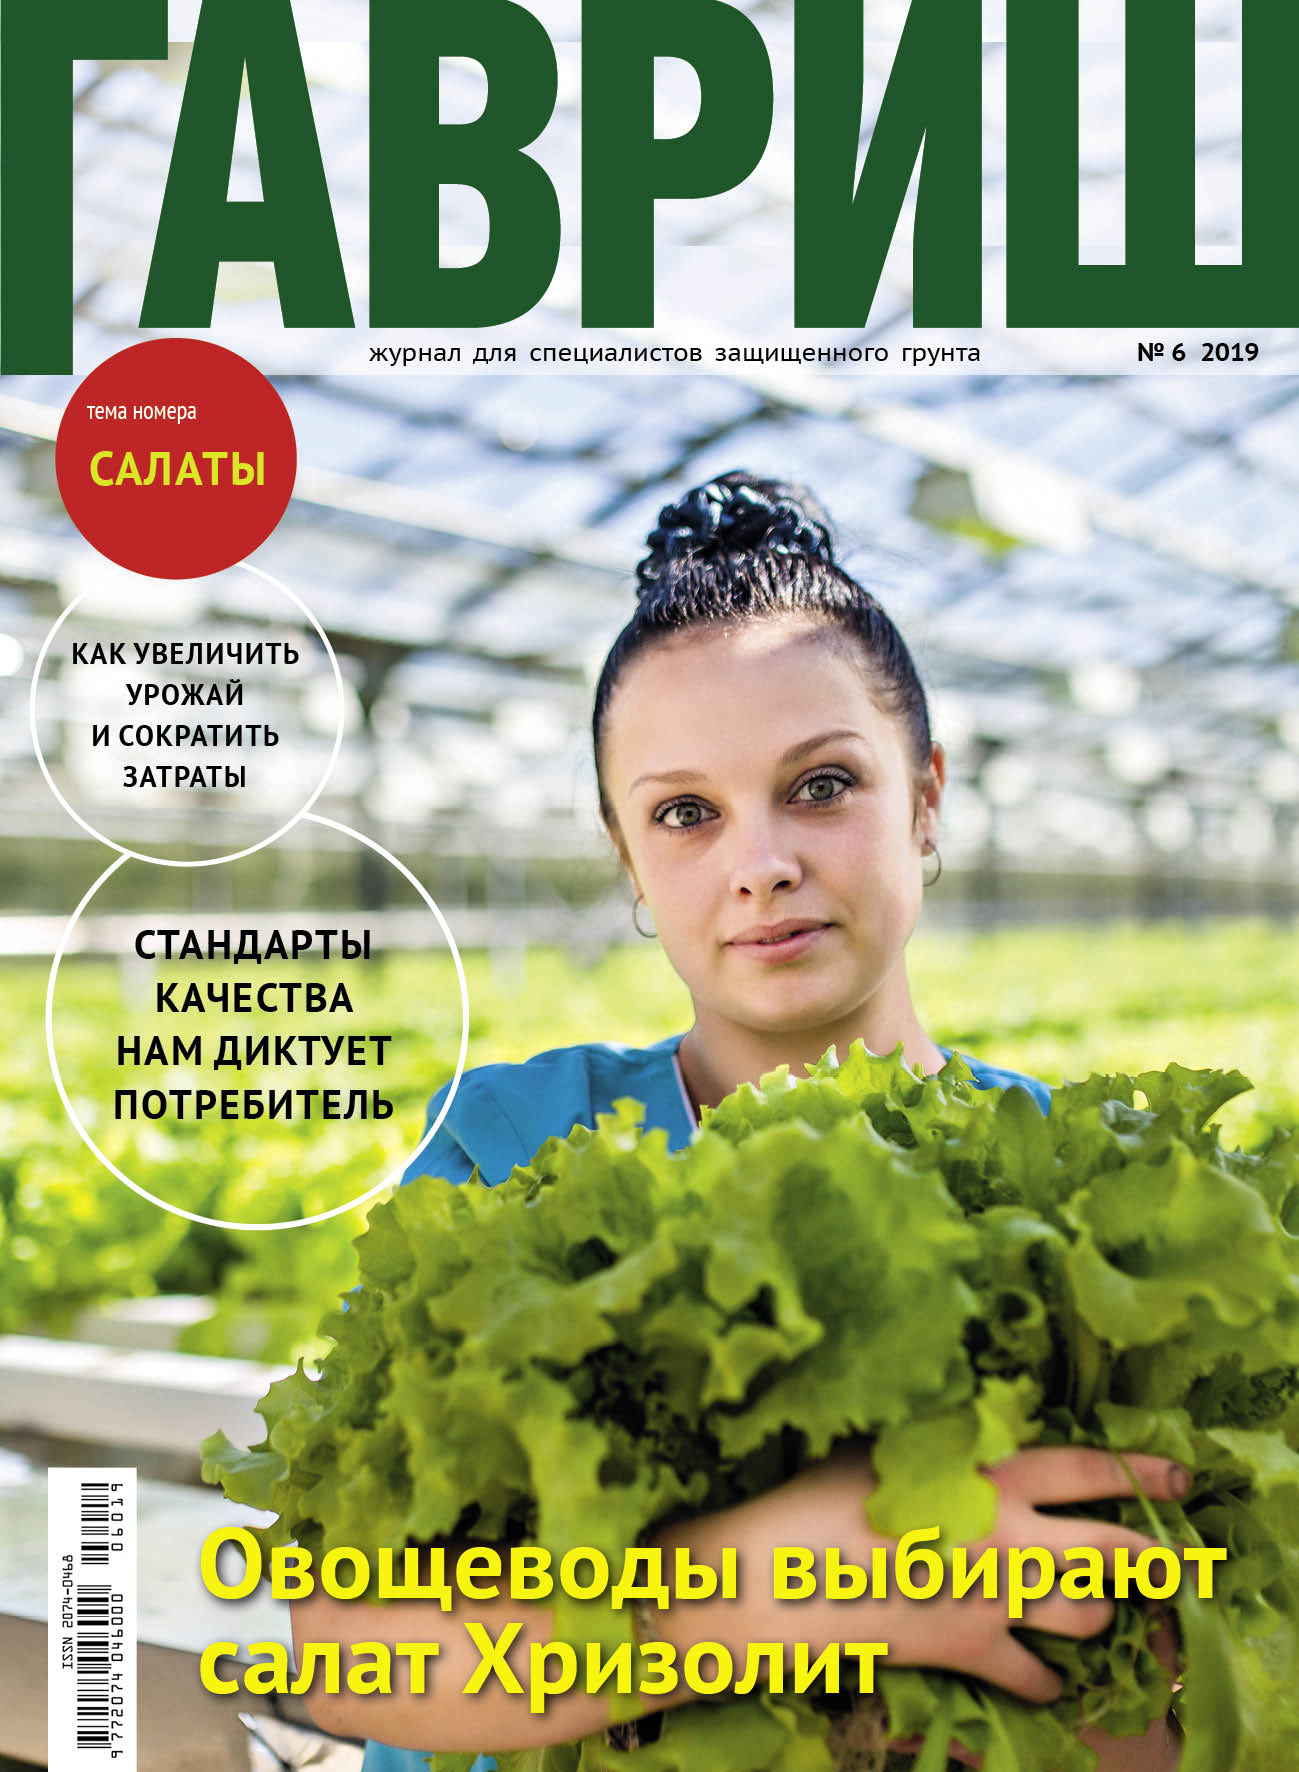 семена гавриш каталог 2021 интернет магазин